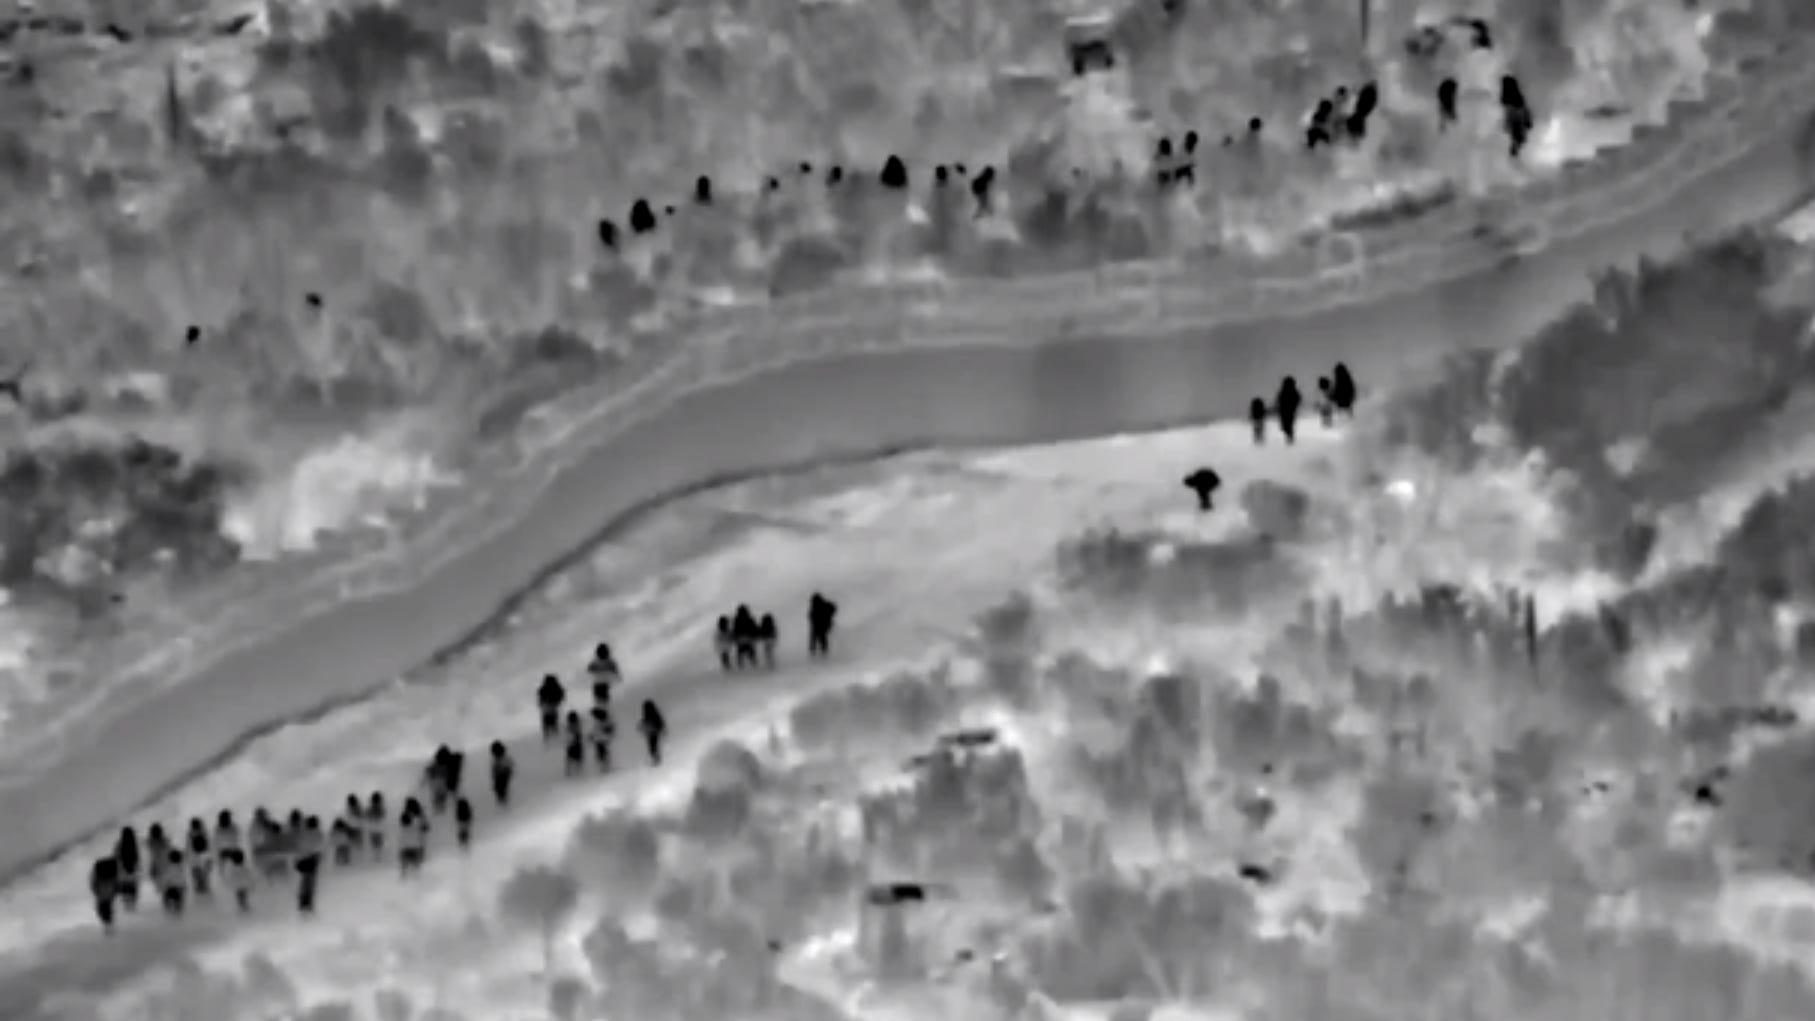 Video shows more than 130 migrants walking around border wall, then entering Arizona